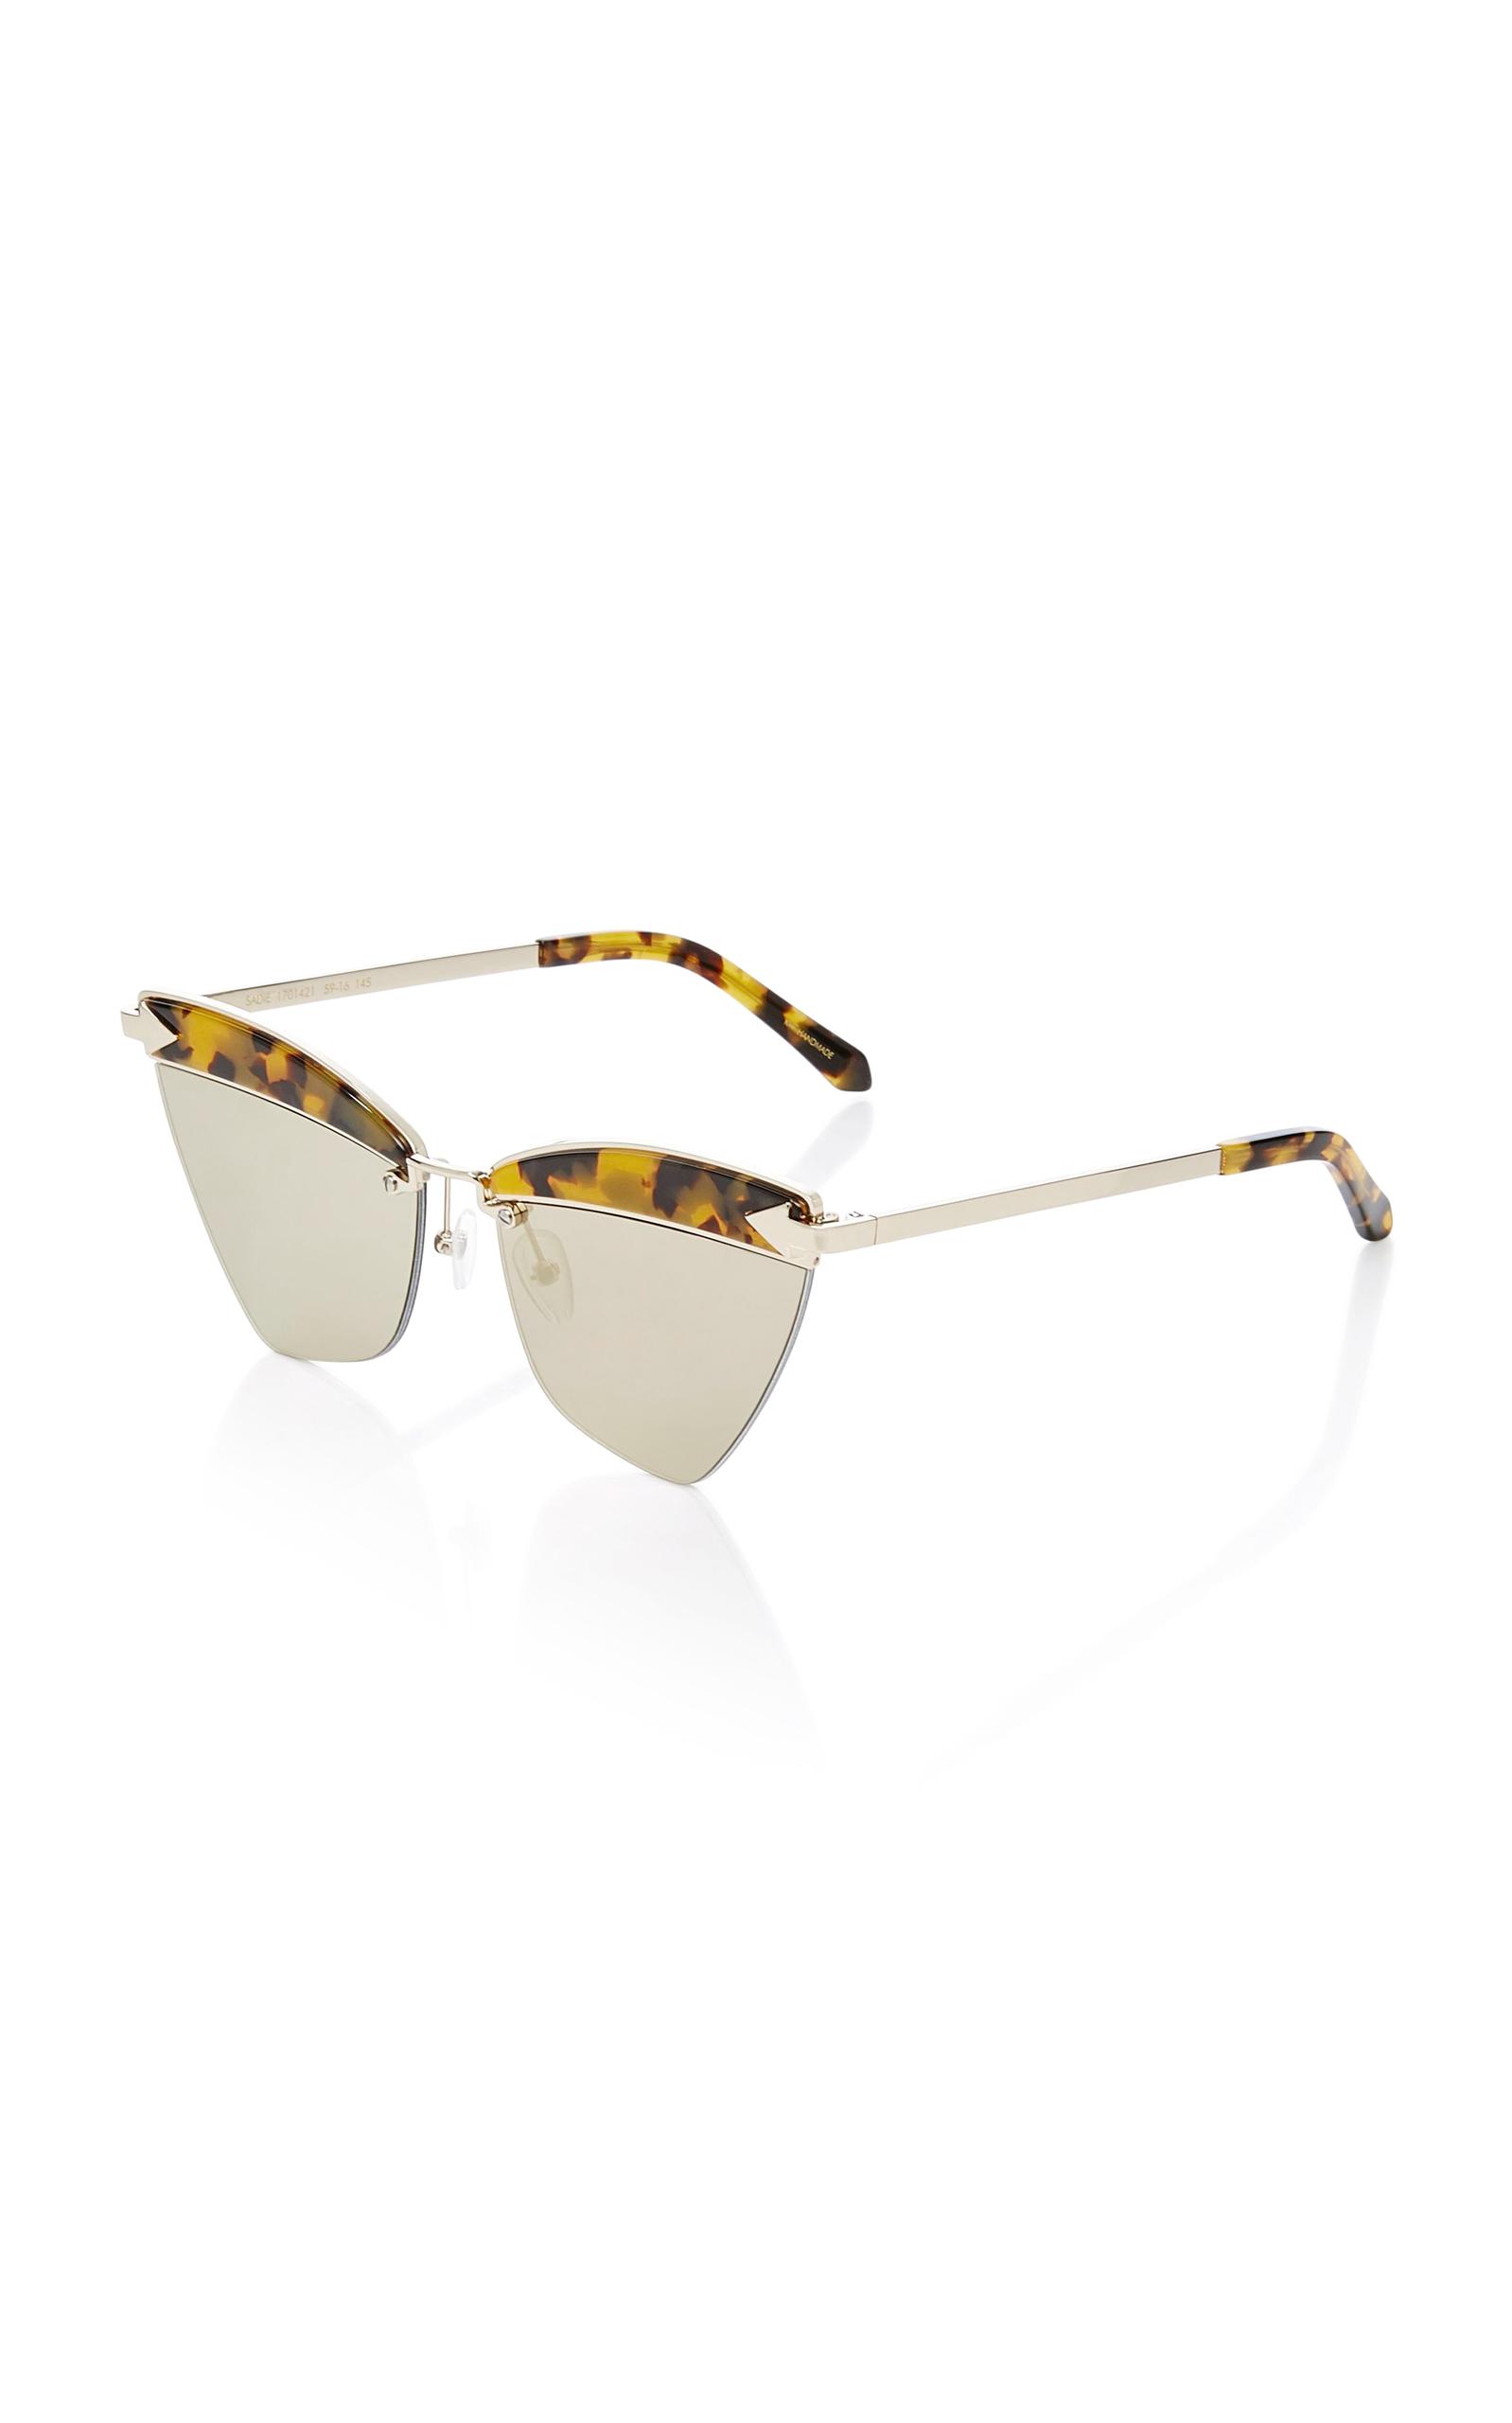 09eaa77a0a67 Karen WalkerSadie Cat-Eye Acetate and Metal Sunglasses. CLOSE. Loading.  Loading